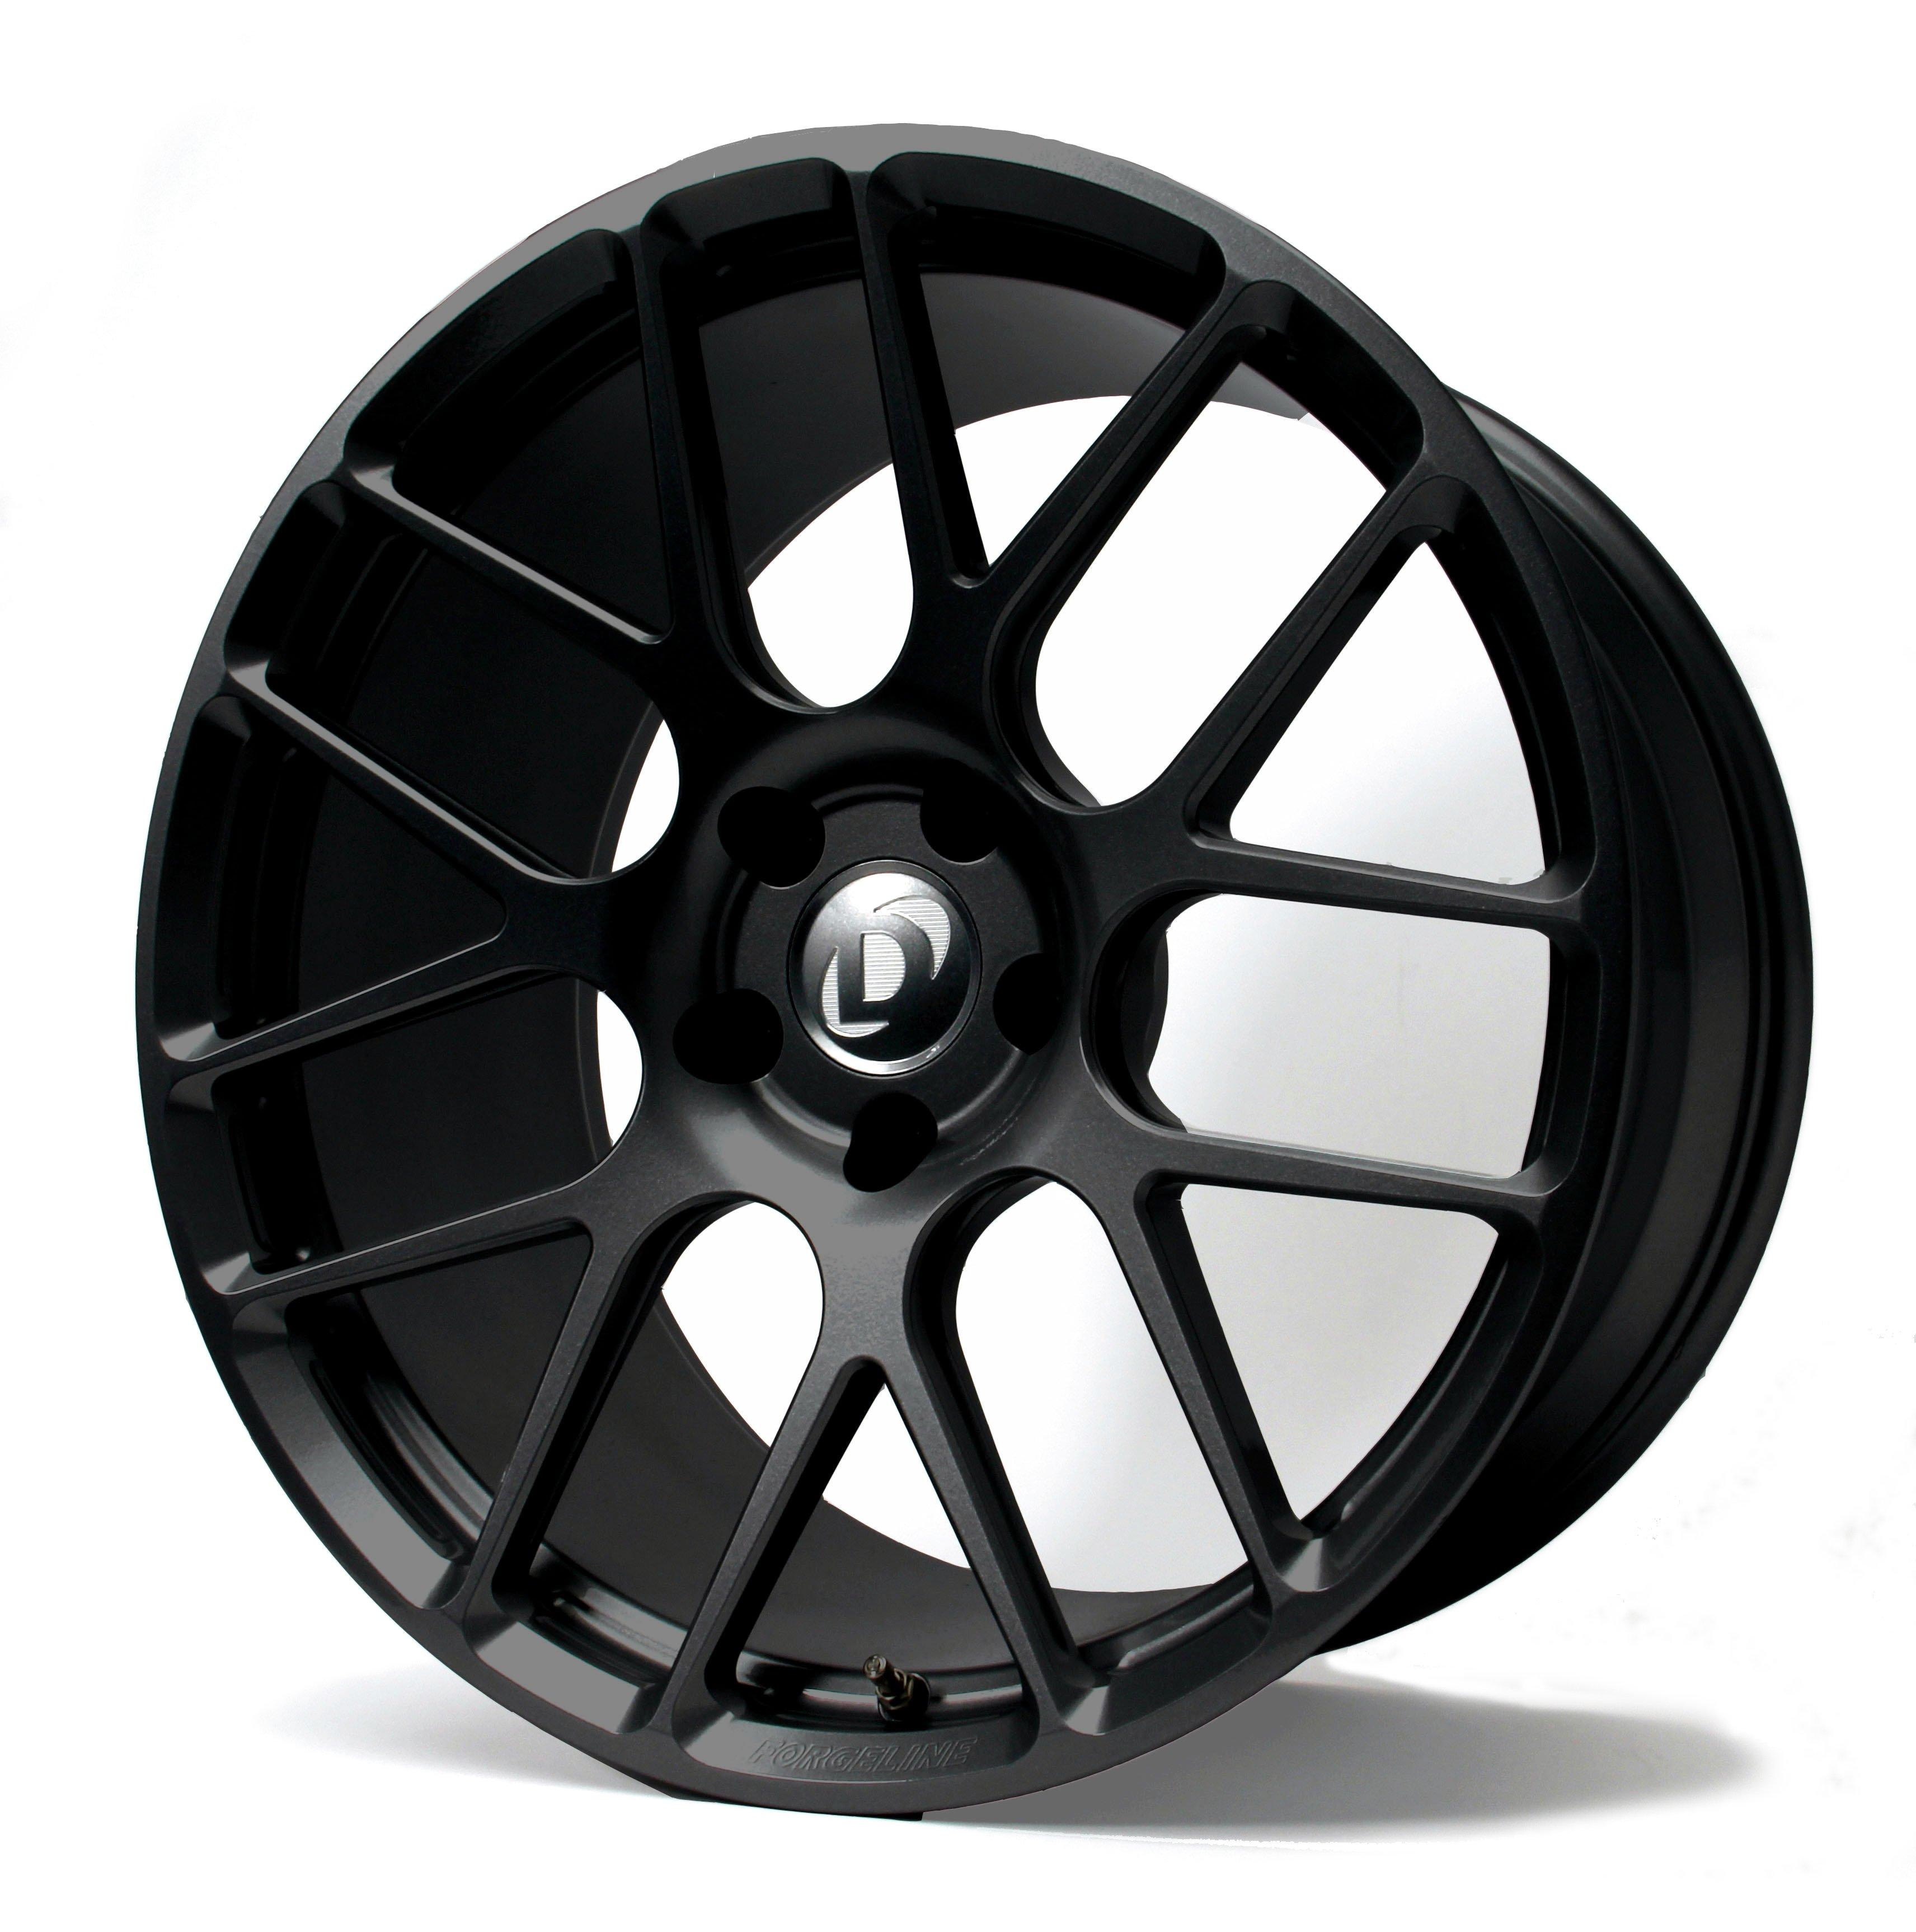 Dinan D750-0087-SE1-BLK Forgeline SE1 Performance Wheel